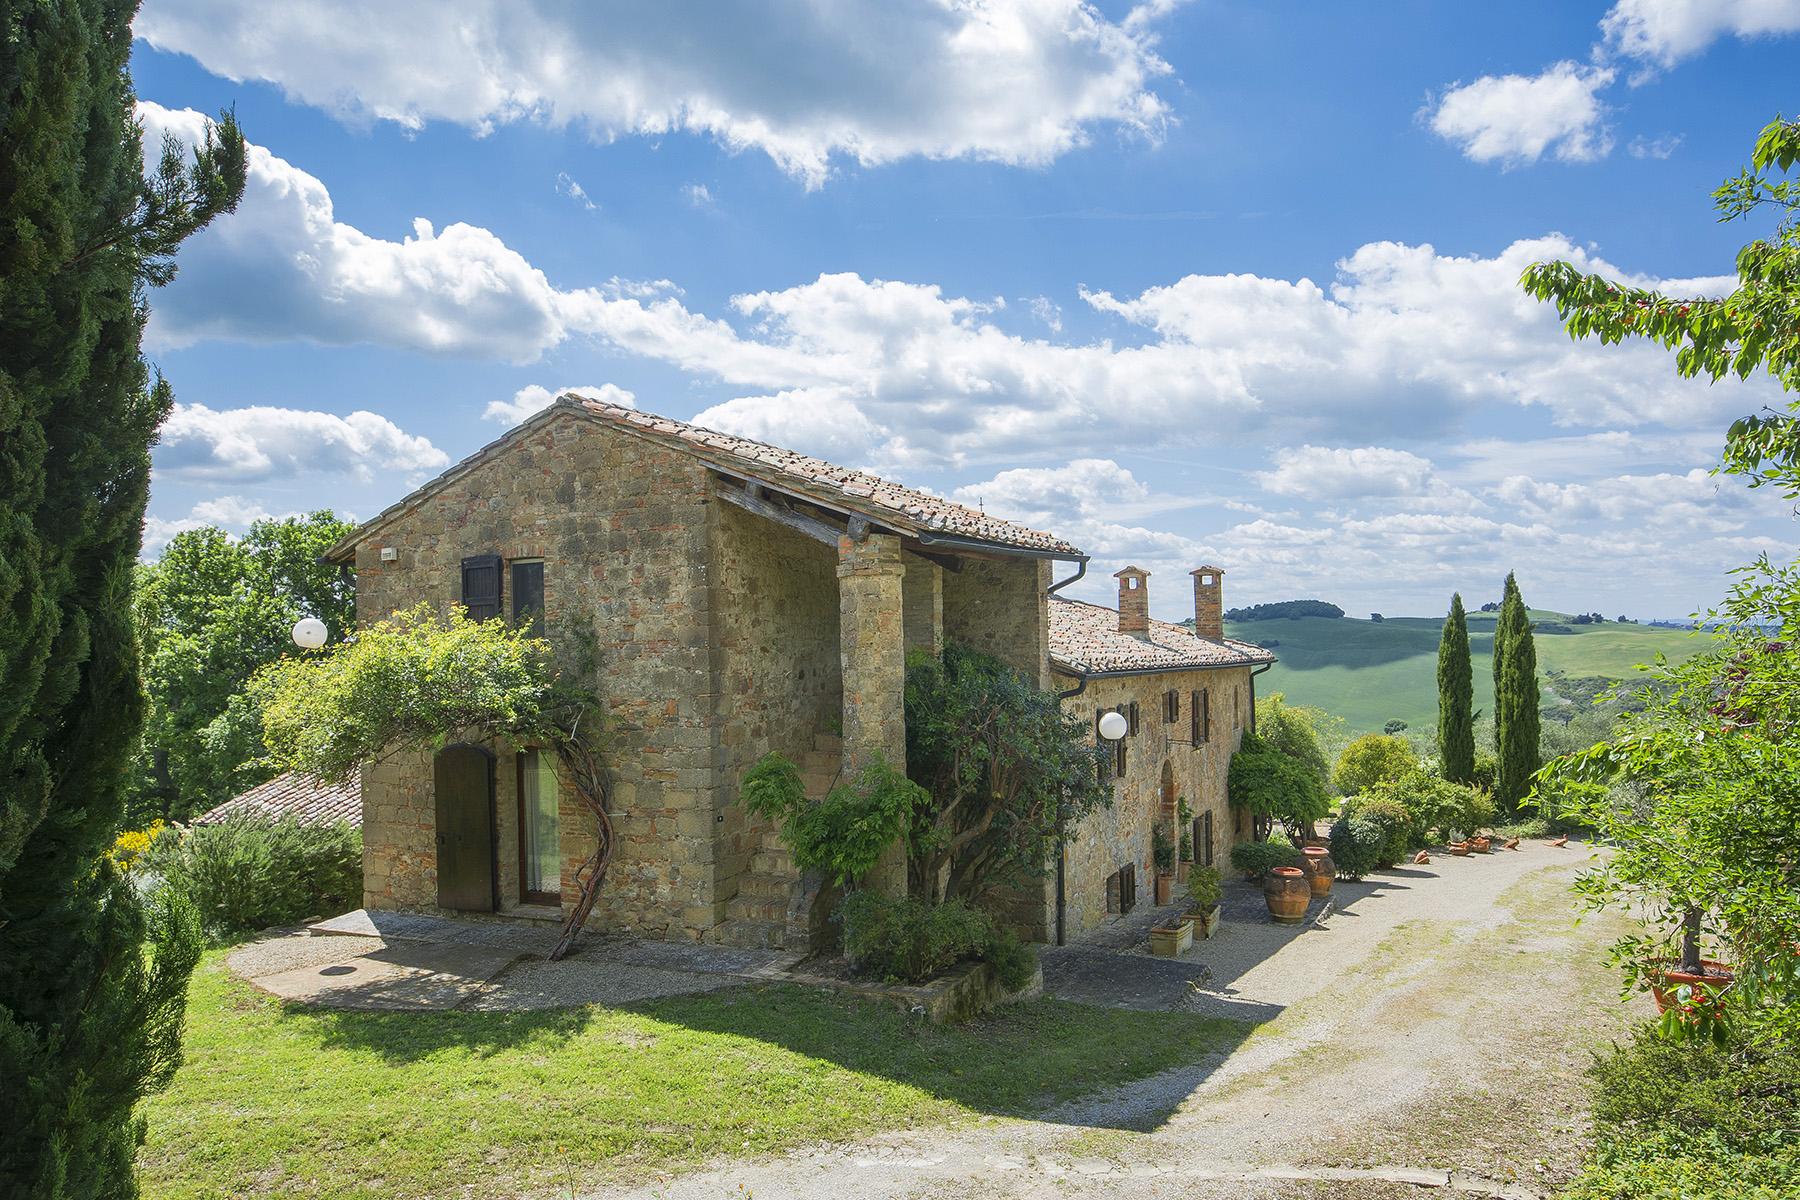 Casa indipendente in Vendita a Pienza: 5 locali, 400 mq - Foto 20